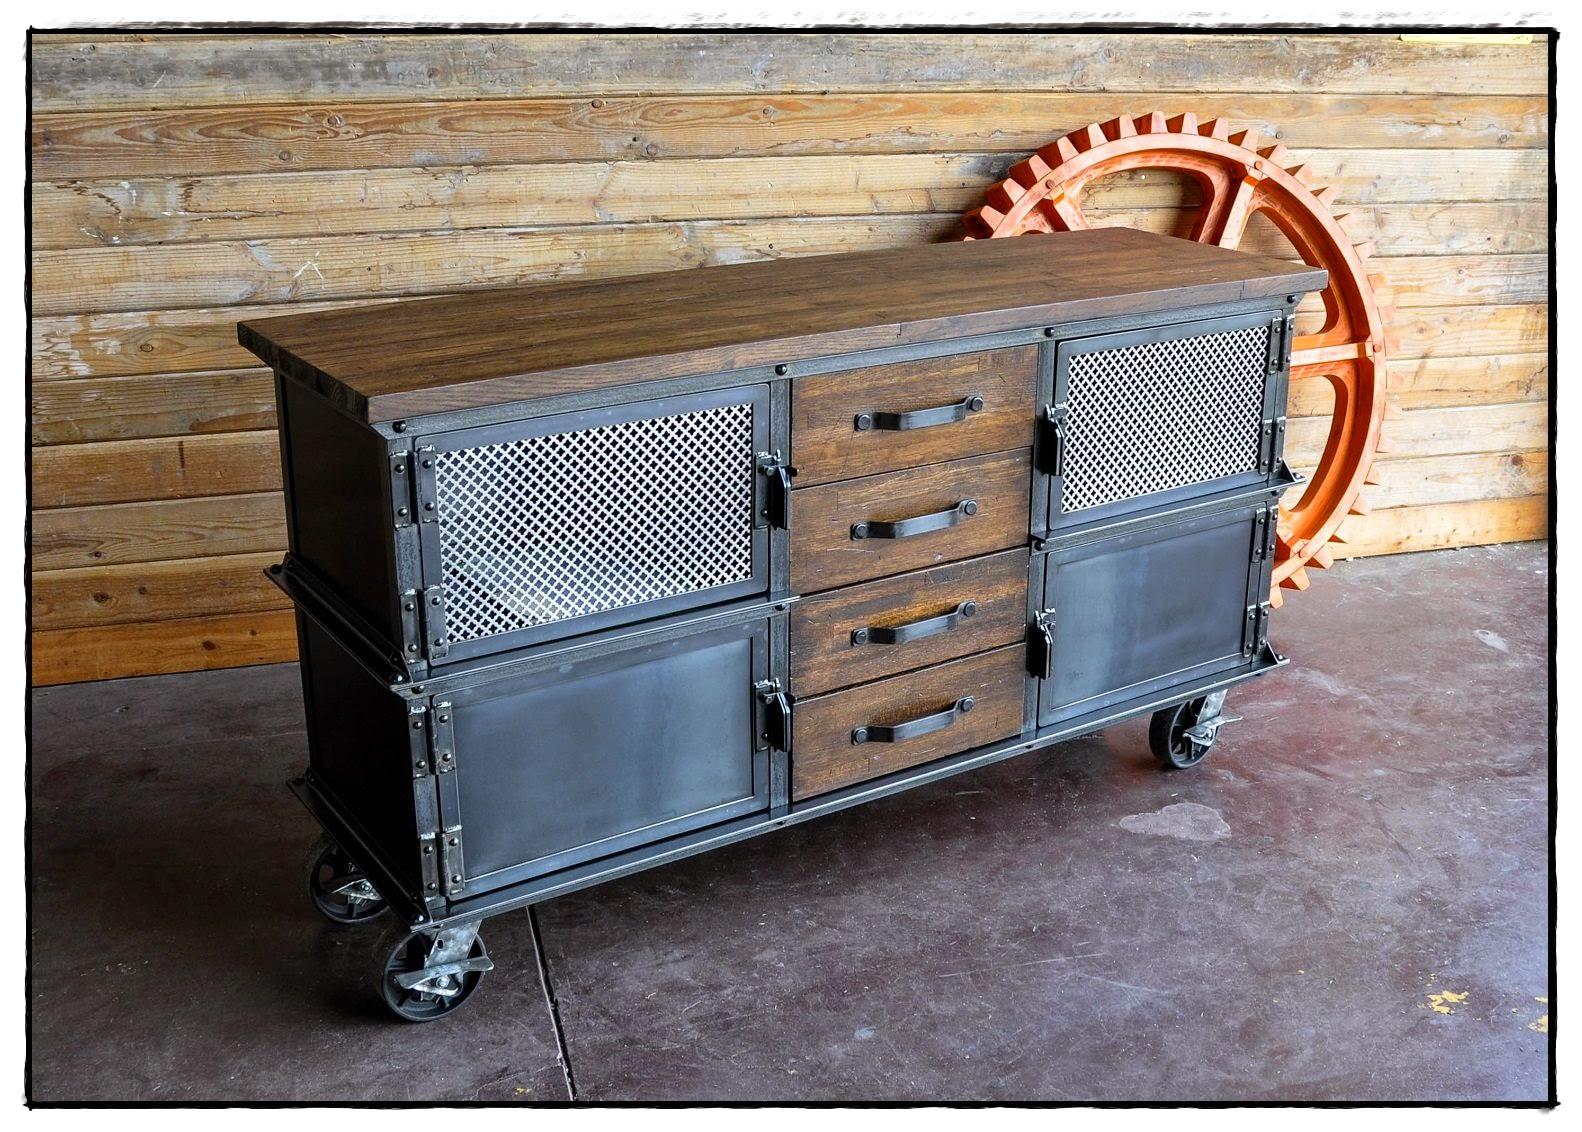 Mueble Muebles De Oficina En C Rdoba Galer A De Fotos De  # Vahume Muebles Cordoba